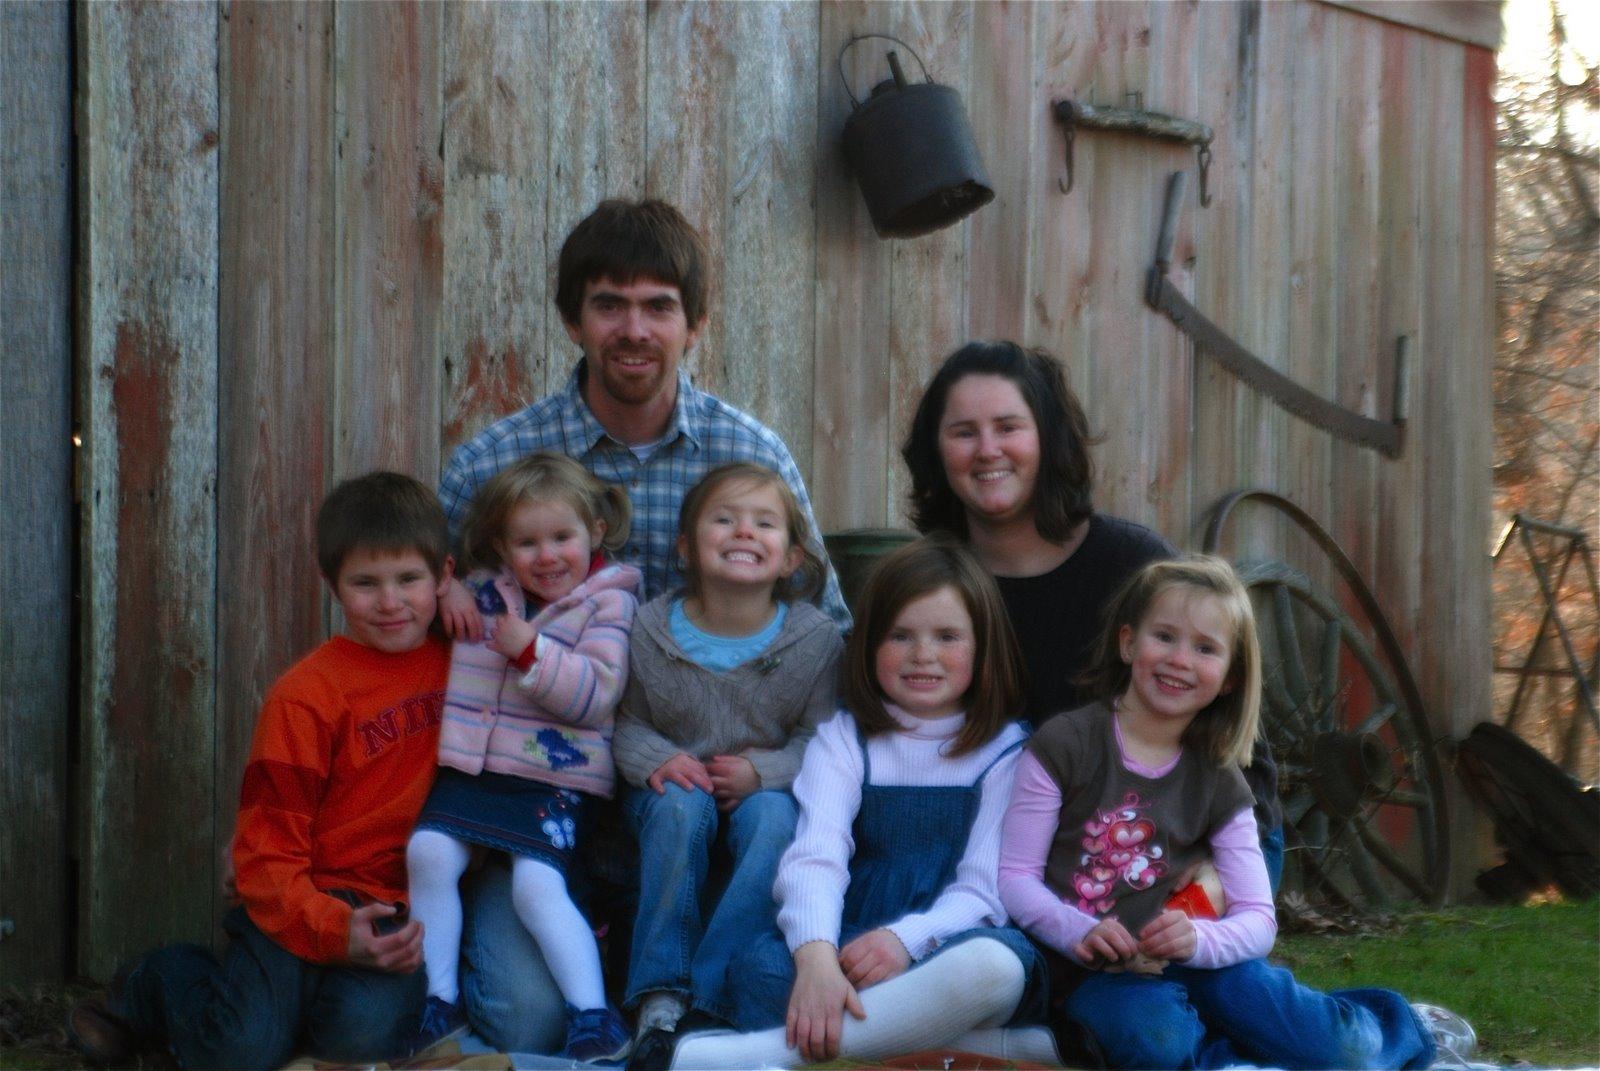 Berberich Family